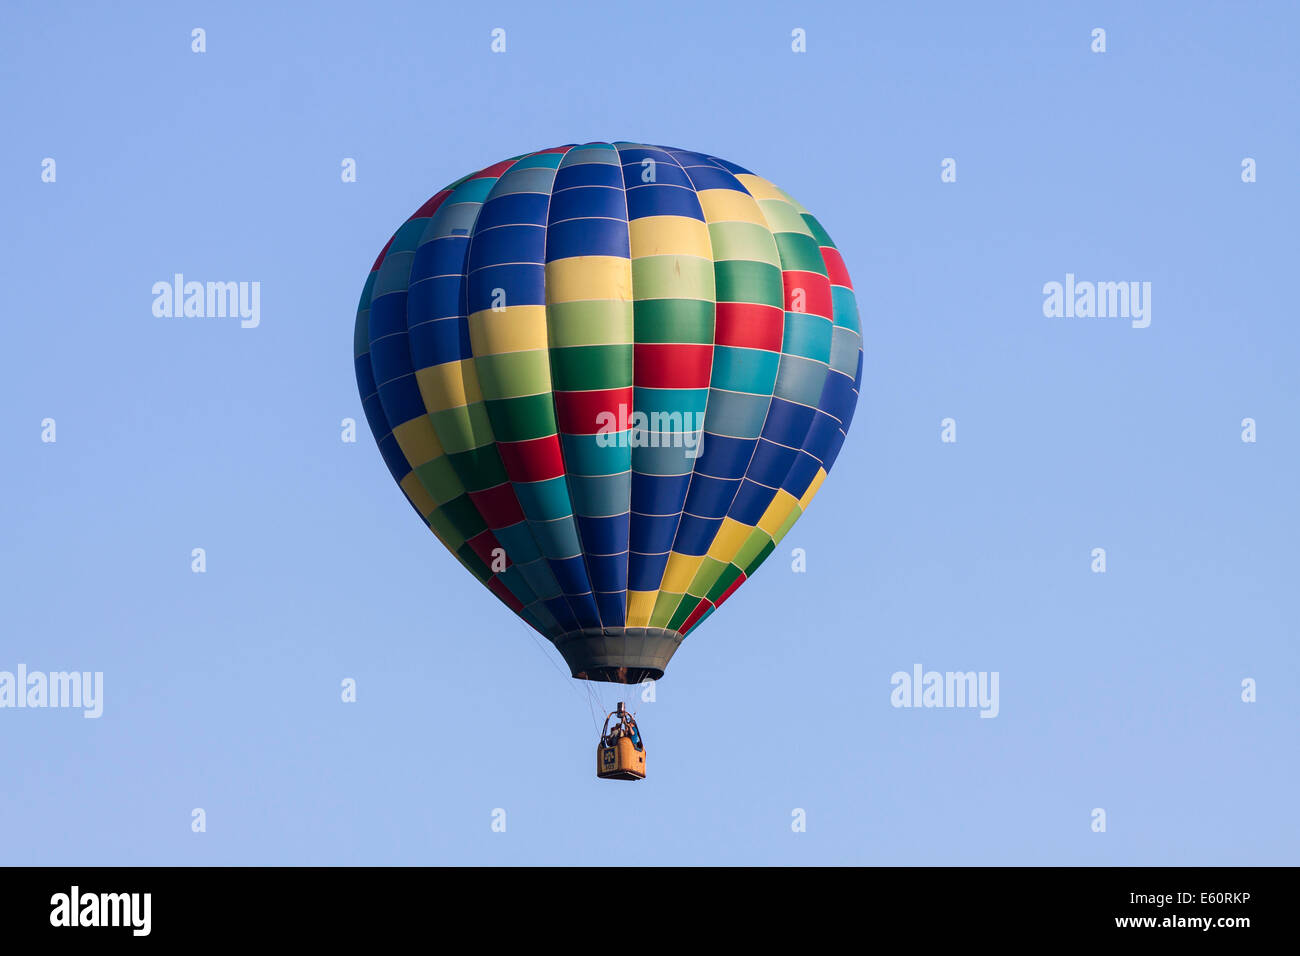 International Balloon Festival of Saint-Jean-sur-Richelieu, Canada - Stock Image